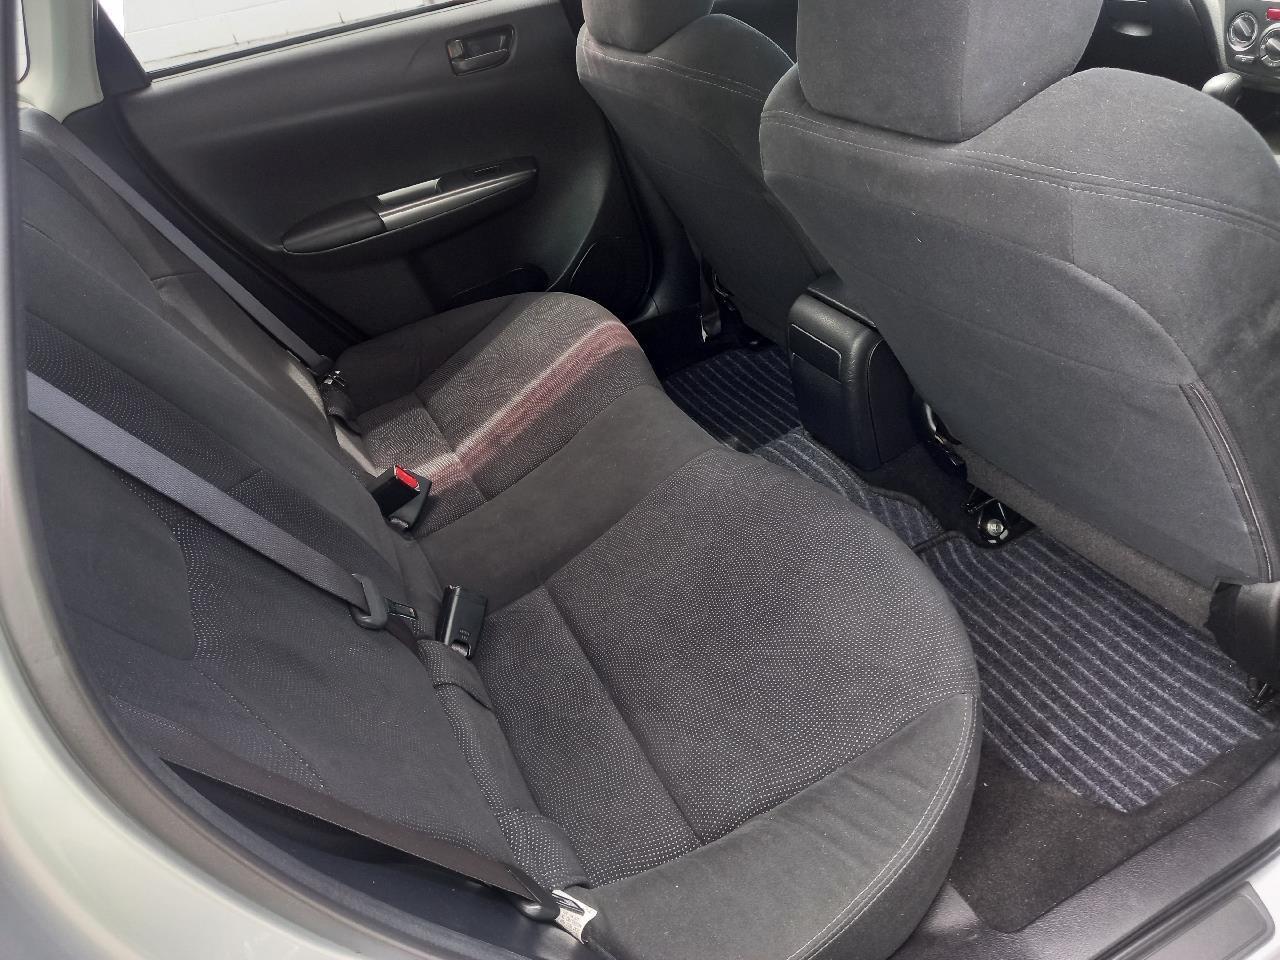 image-8, 2012 Subaru Impreza AWD No Deposit Finance at Dunedin